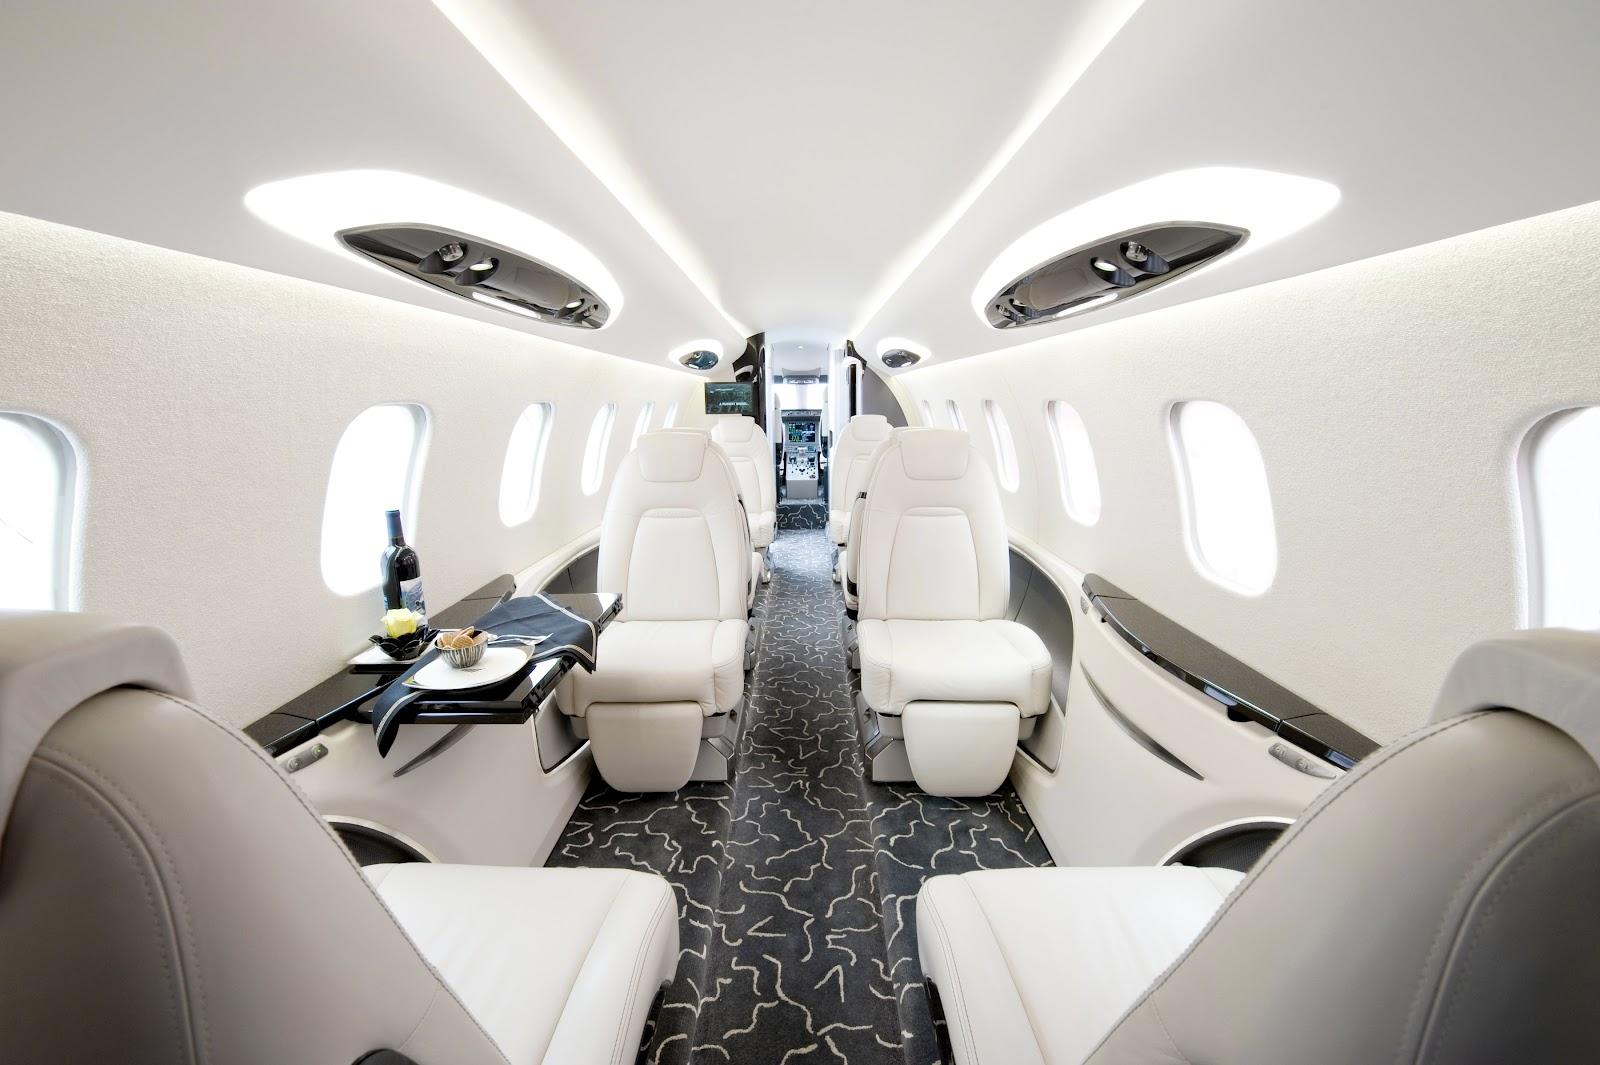 cabin-interior-of-private-jet-bombardier-learjet-85-